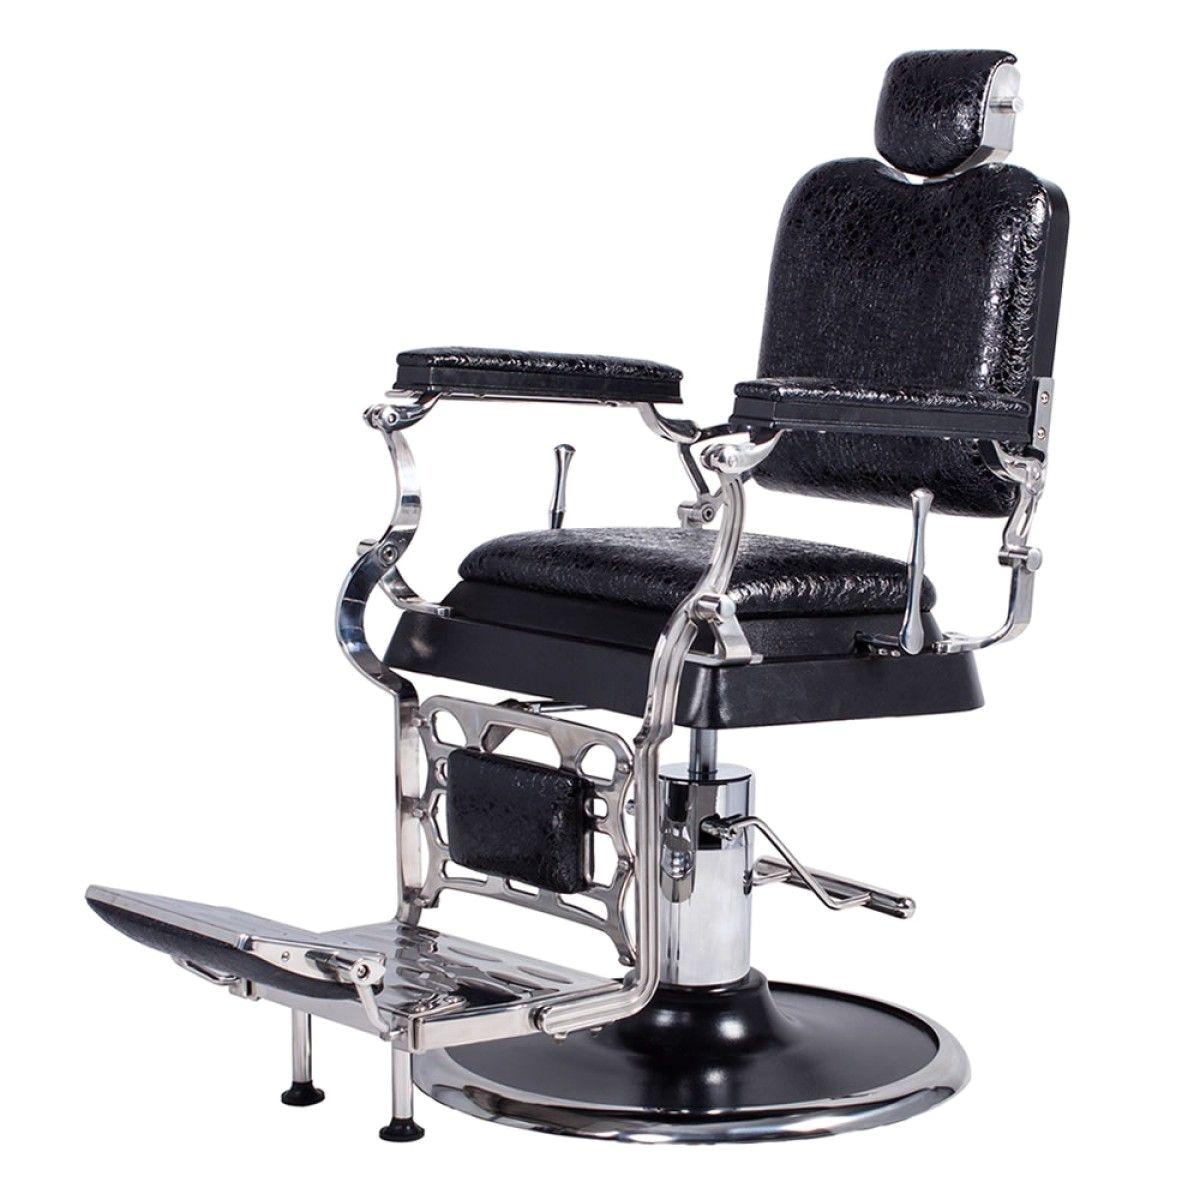 Vintage Barber Shop Chairs for Sale Emperor Antique Barber Chair Antique  Barber Chair Vintage Barber - Vintage Barber Shop Chairs For Sale Emperor Antique Barber Chair